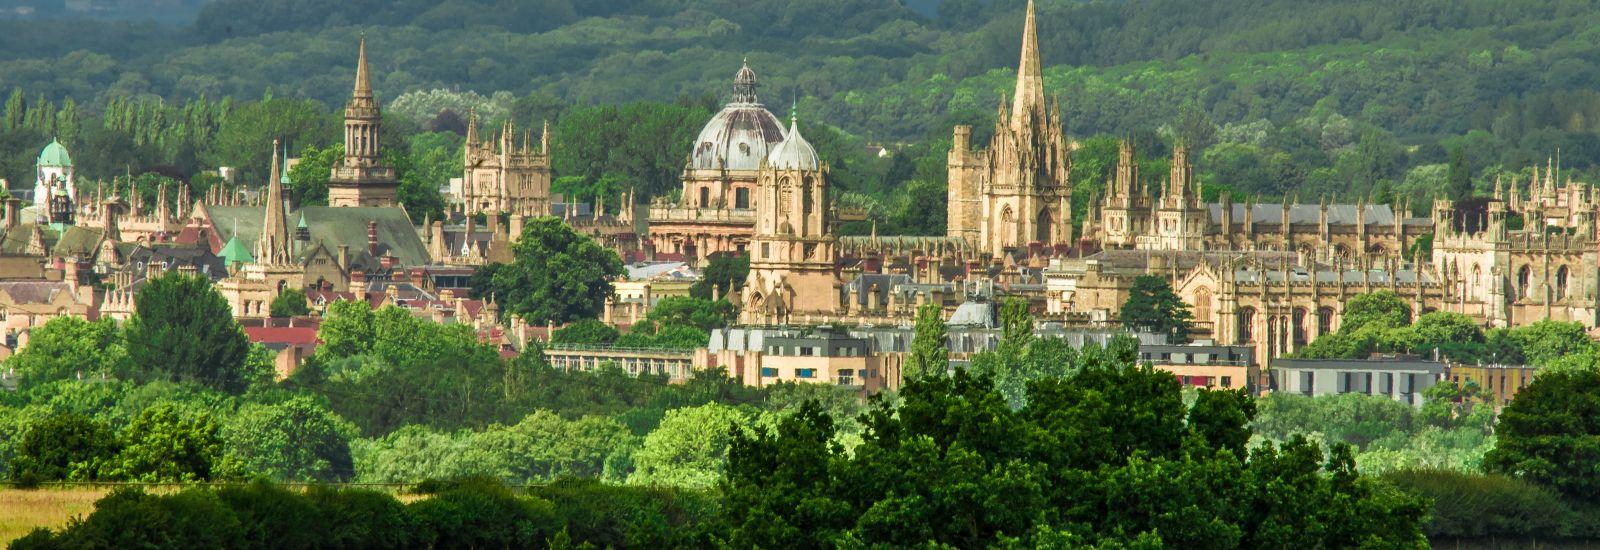 Oxford skyline